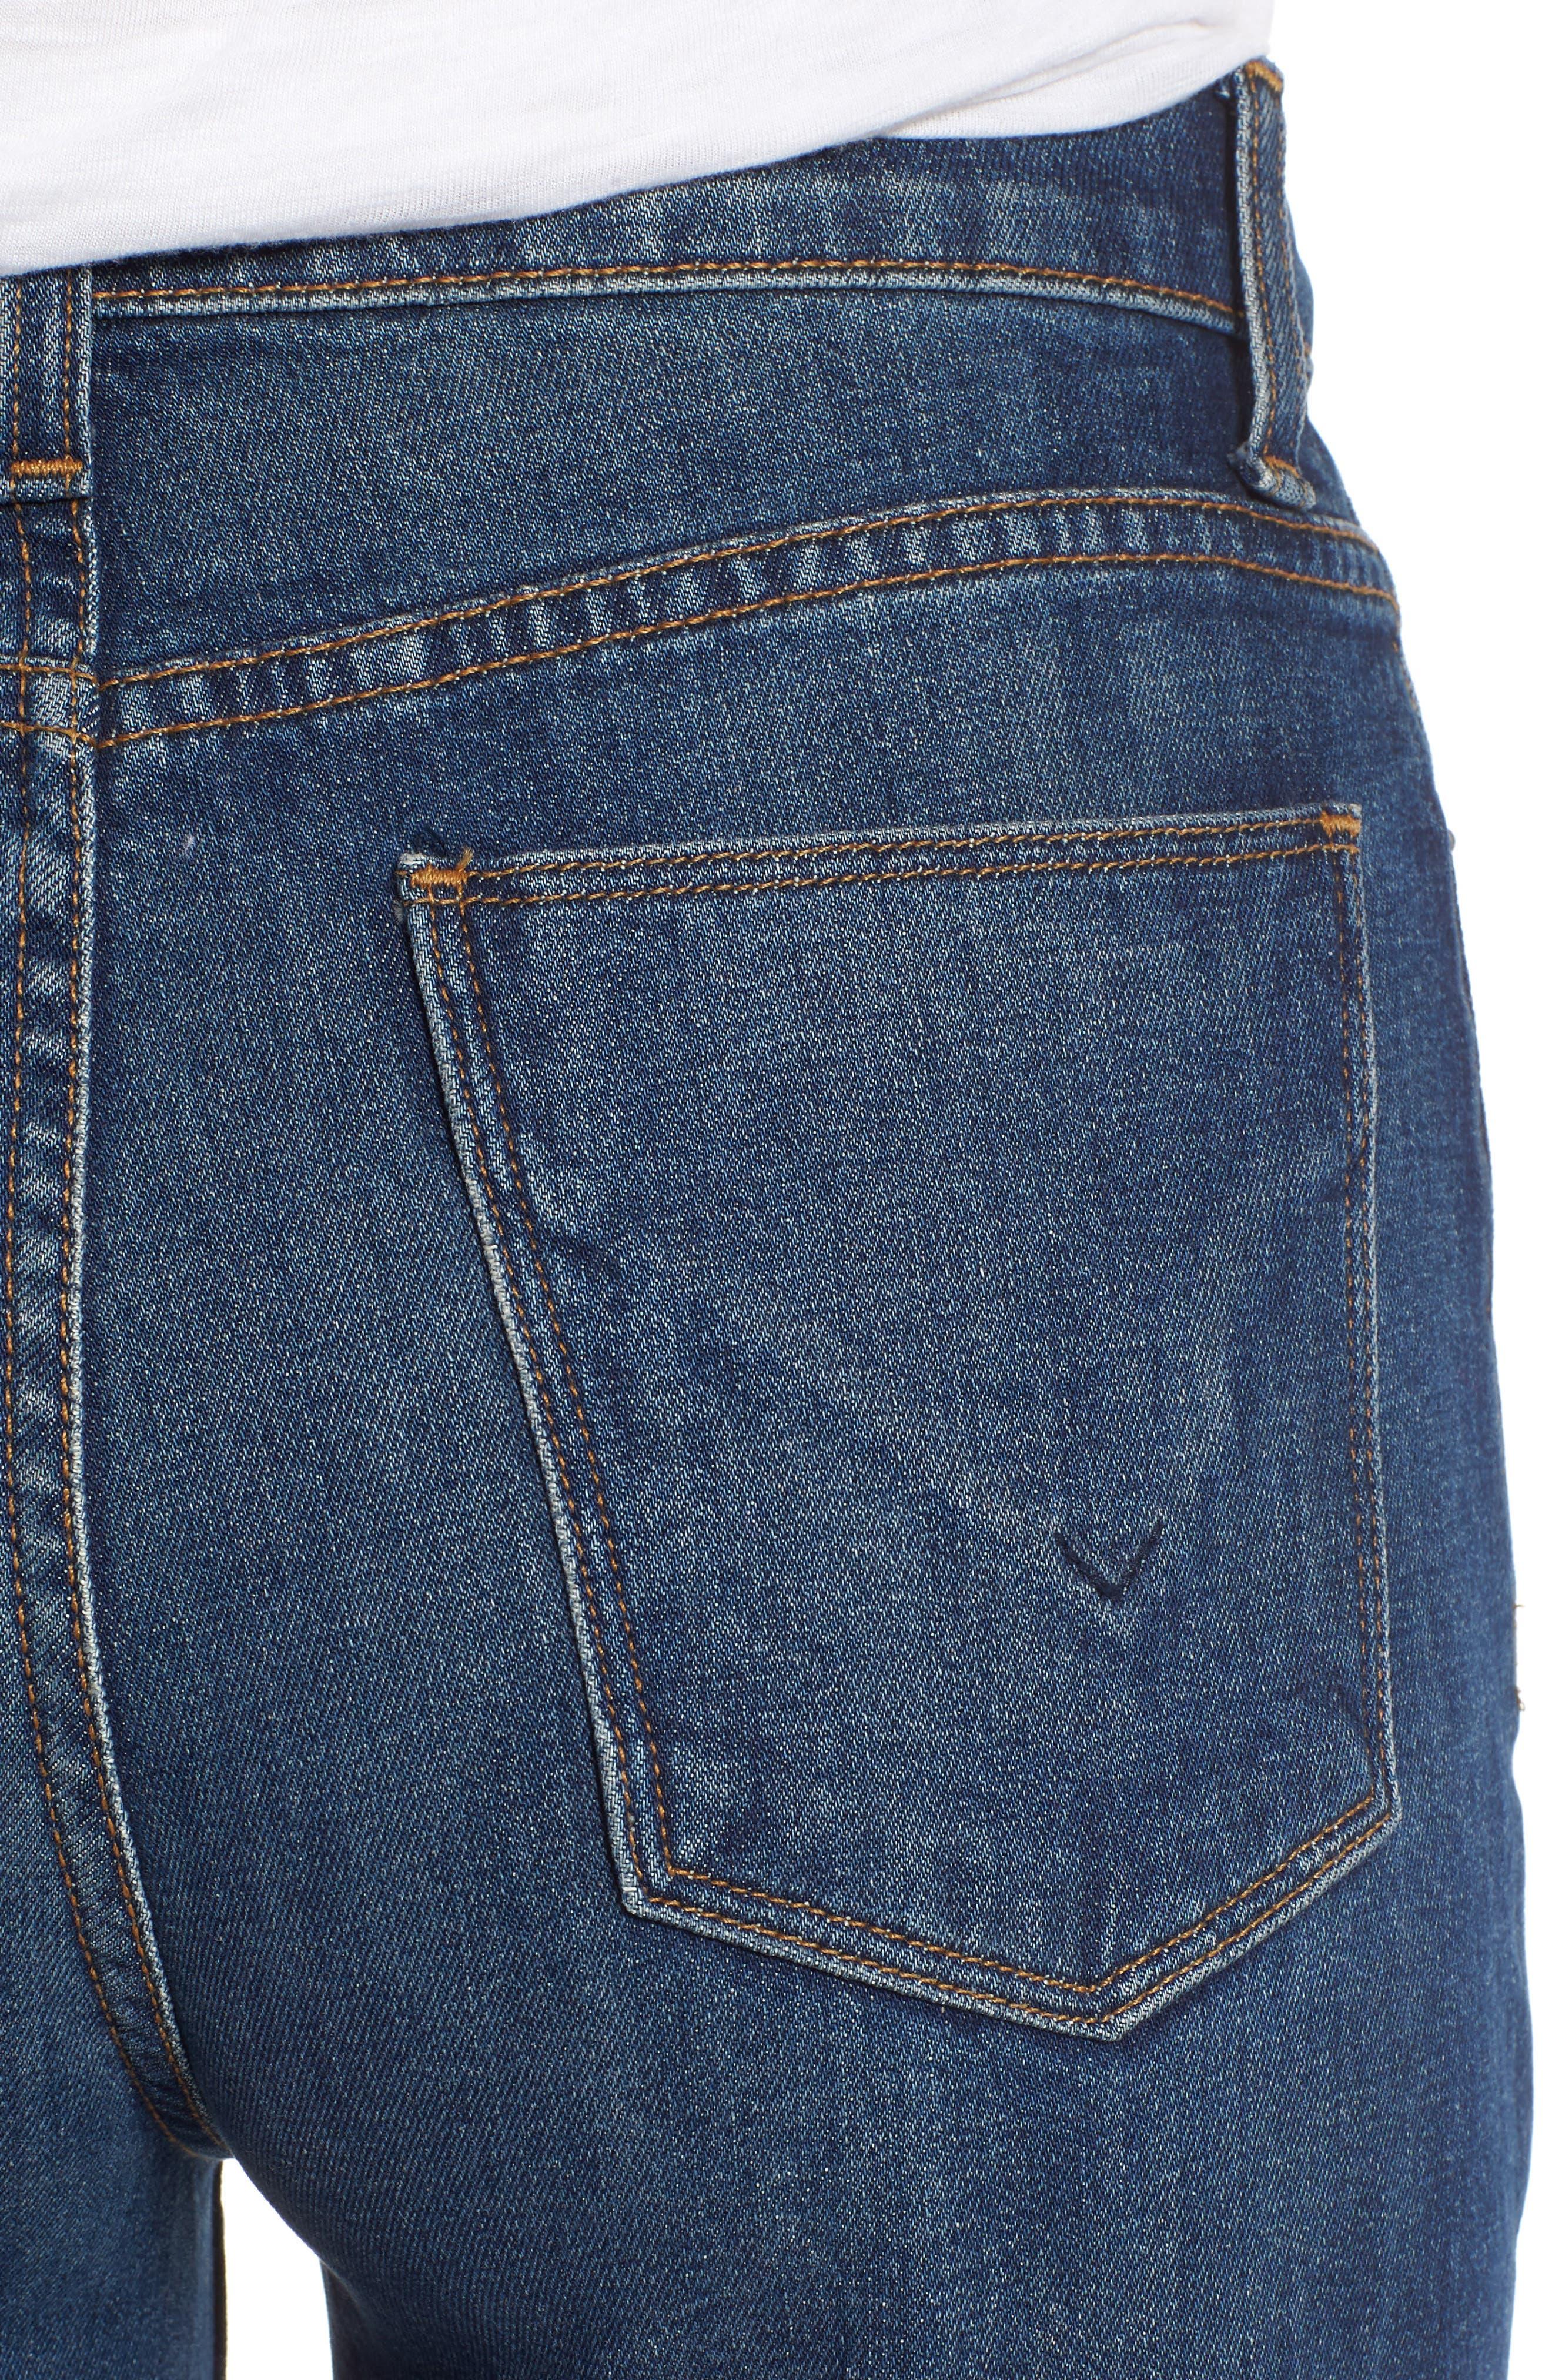 Zoeey High Waist Crop Straight Leg Jeans,                             Alternate thumbnail 4, color,                             402